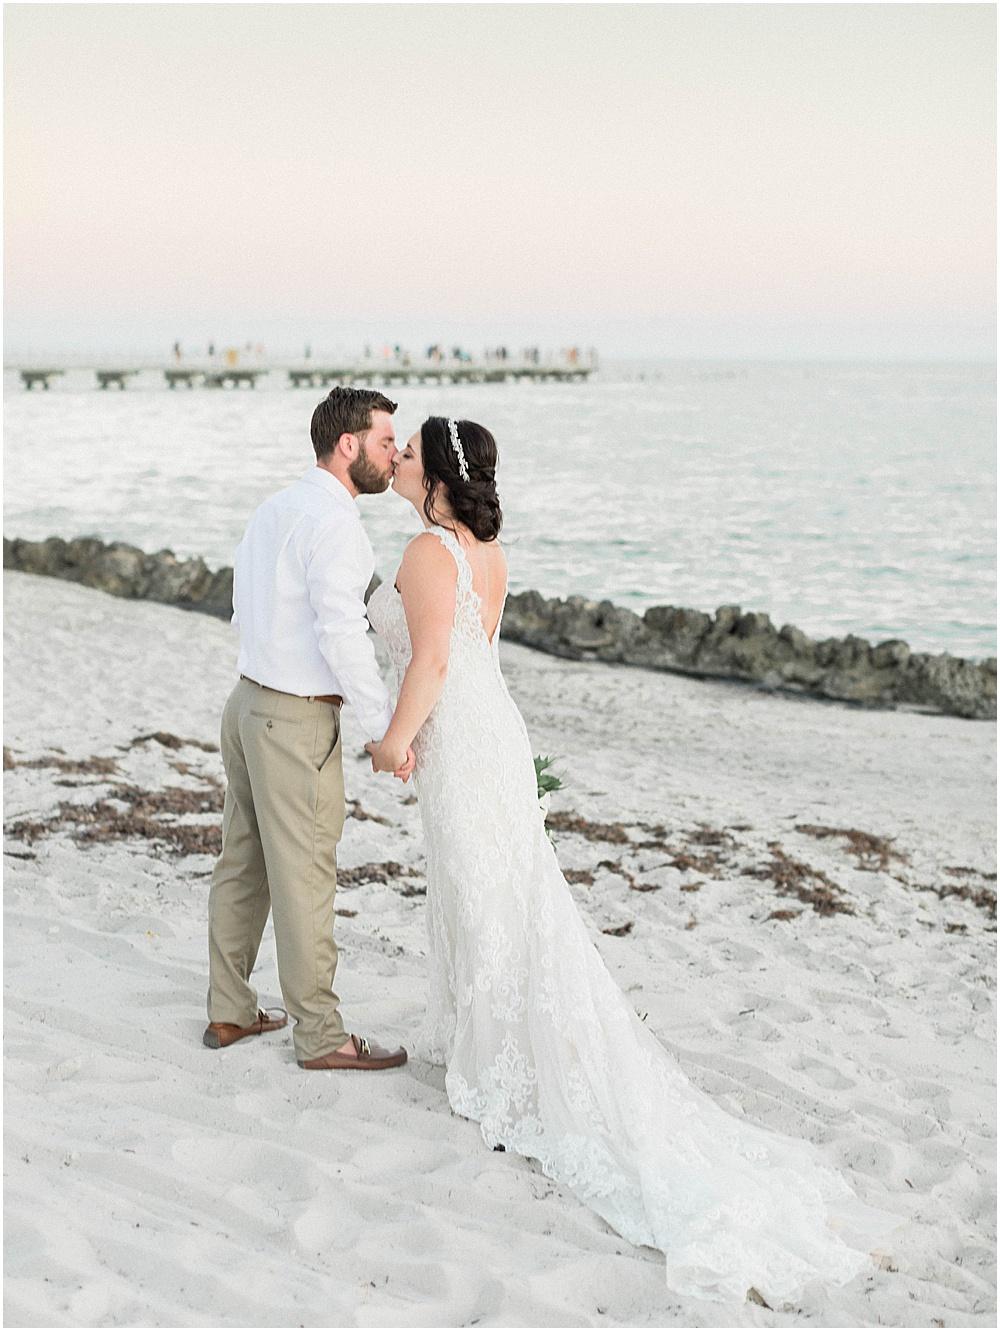 casa_marina_key_west_florida_destination_palm_trees_boston_wedding_photographer_meredith_jane_photography_photo_0111.jpg